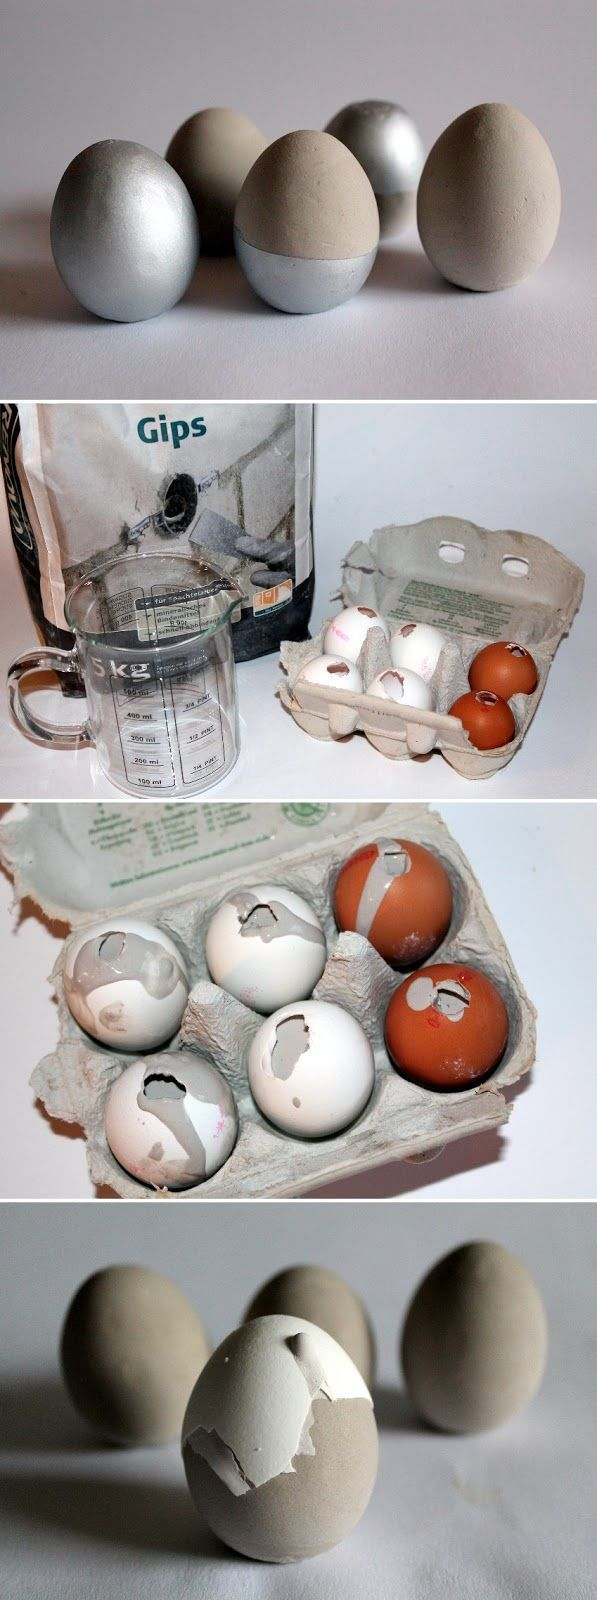 DIY plaster / Concrete eggs + instructions: DIY, crafts, do it yourself, easter eggs, Easter ... DIY plaster / Concrete eggs + instructions: DIY, crafts, do it yourself, easter eggs, Easter eggs ...